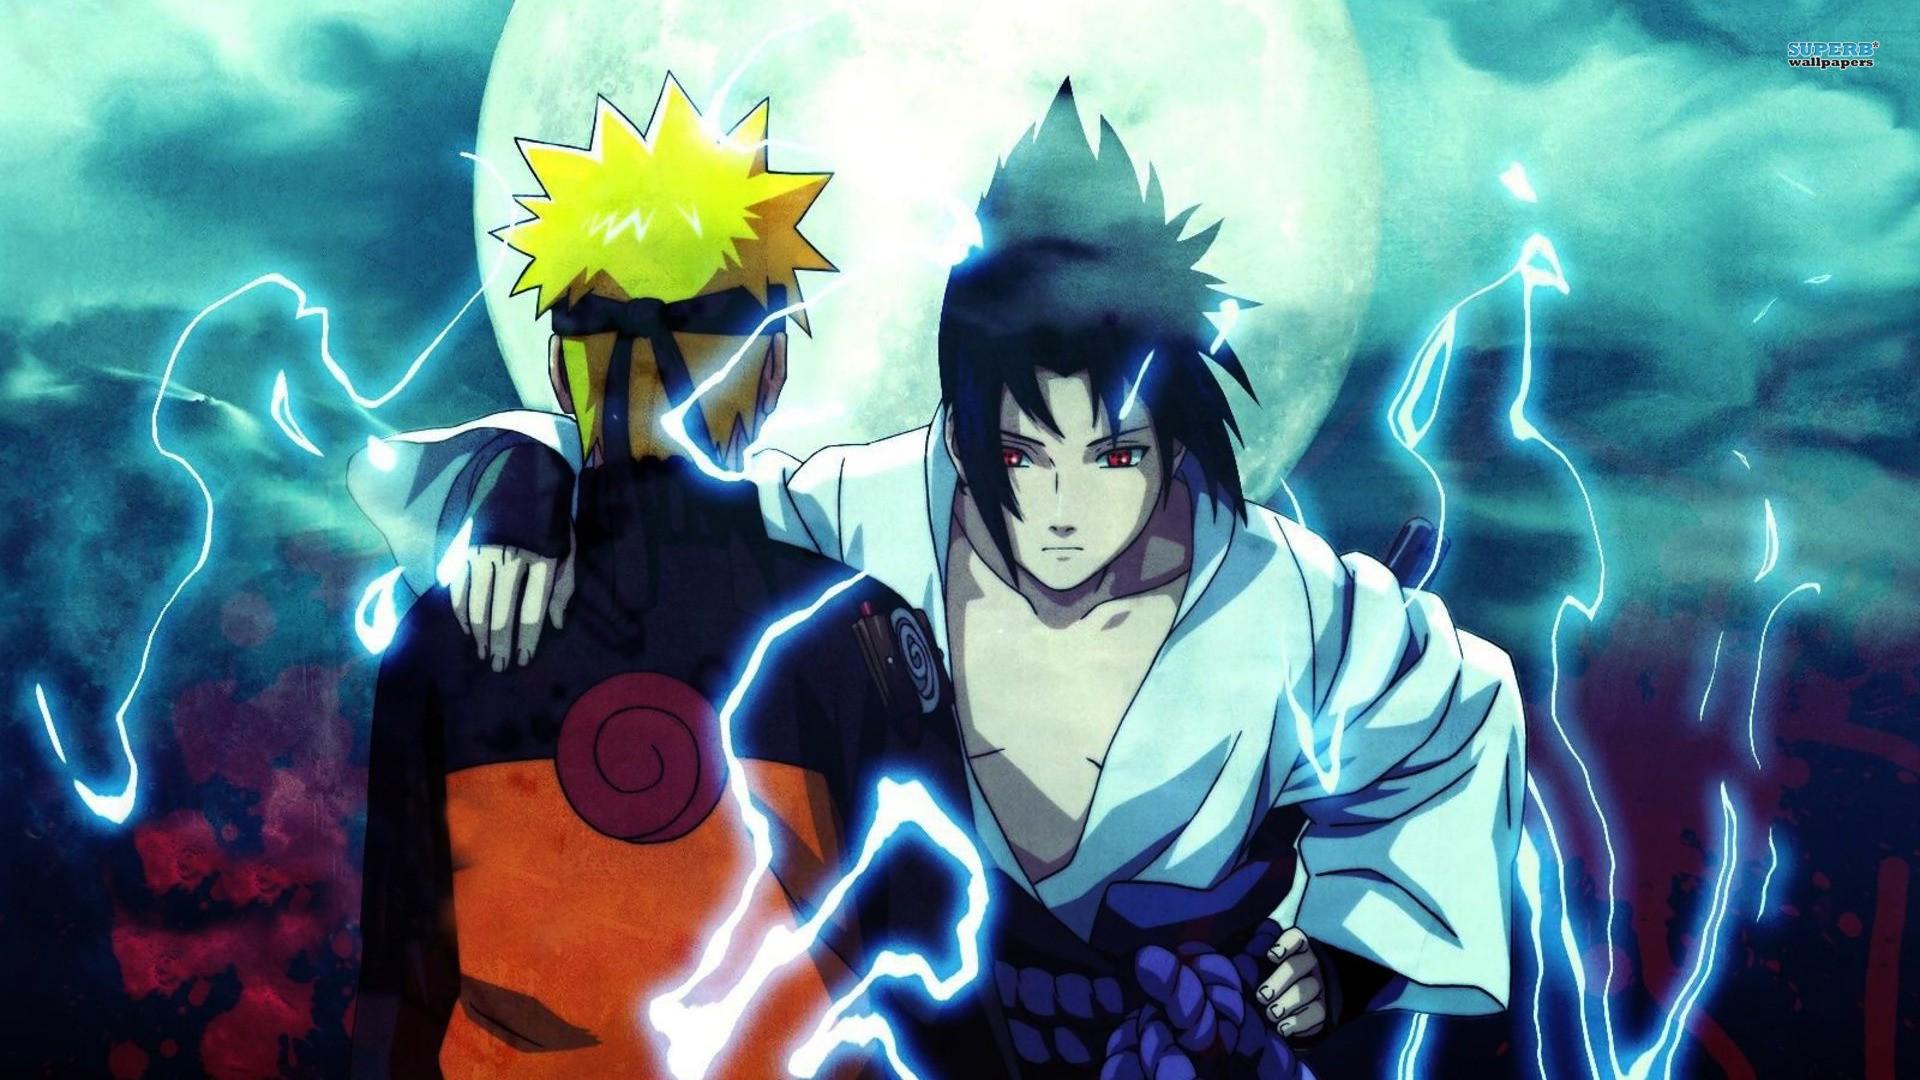 Naruto Sasuke Shippuden Pictures HD Wallpaper of Anime 1920x1080